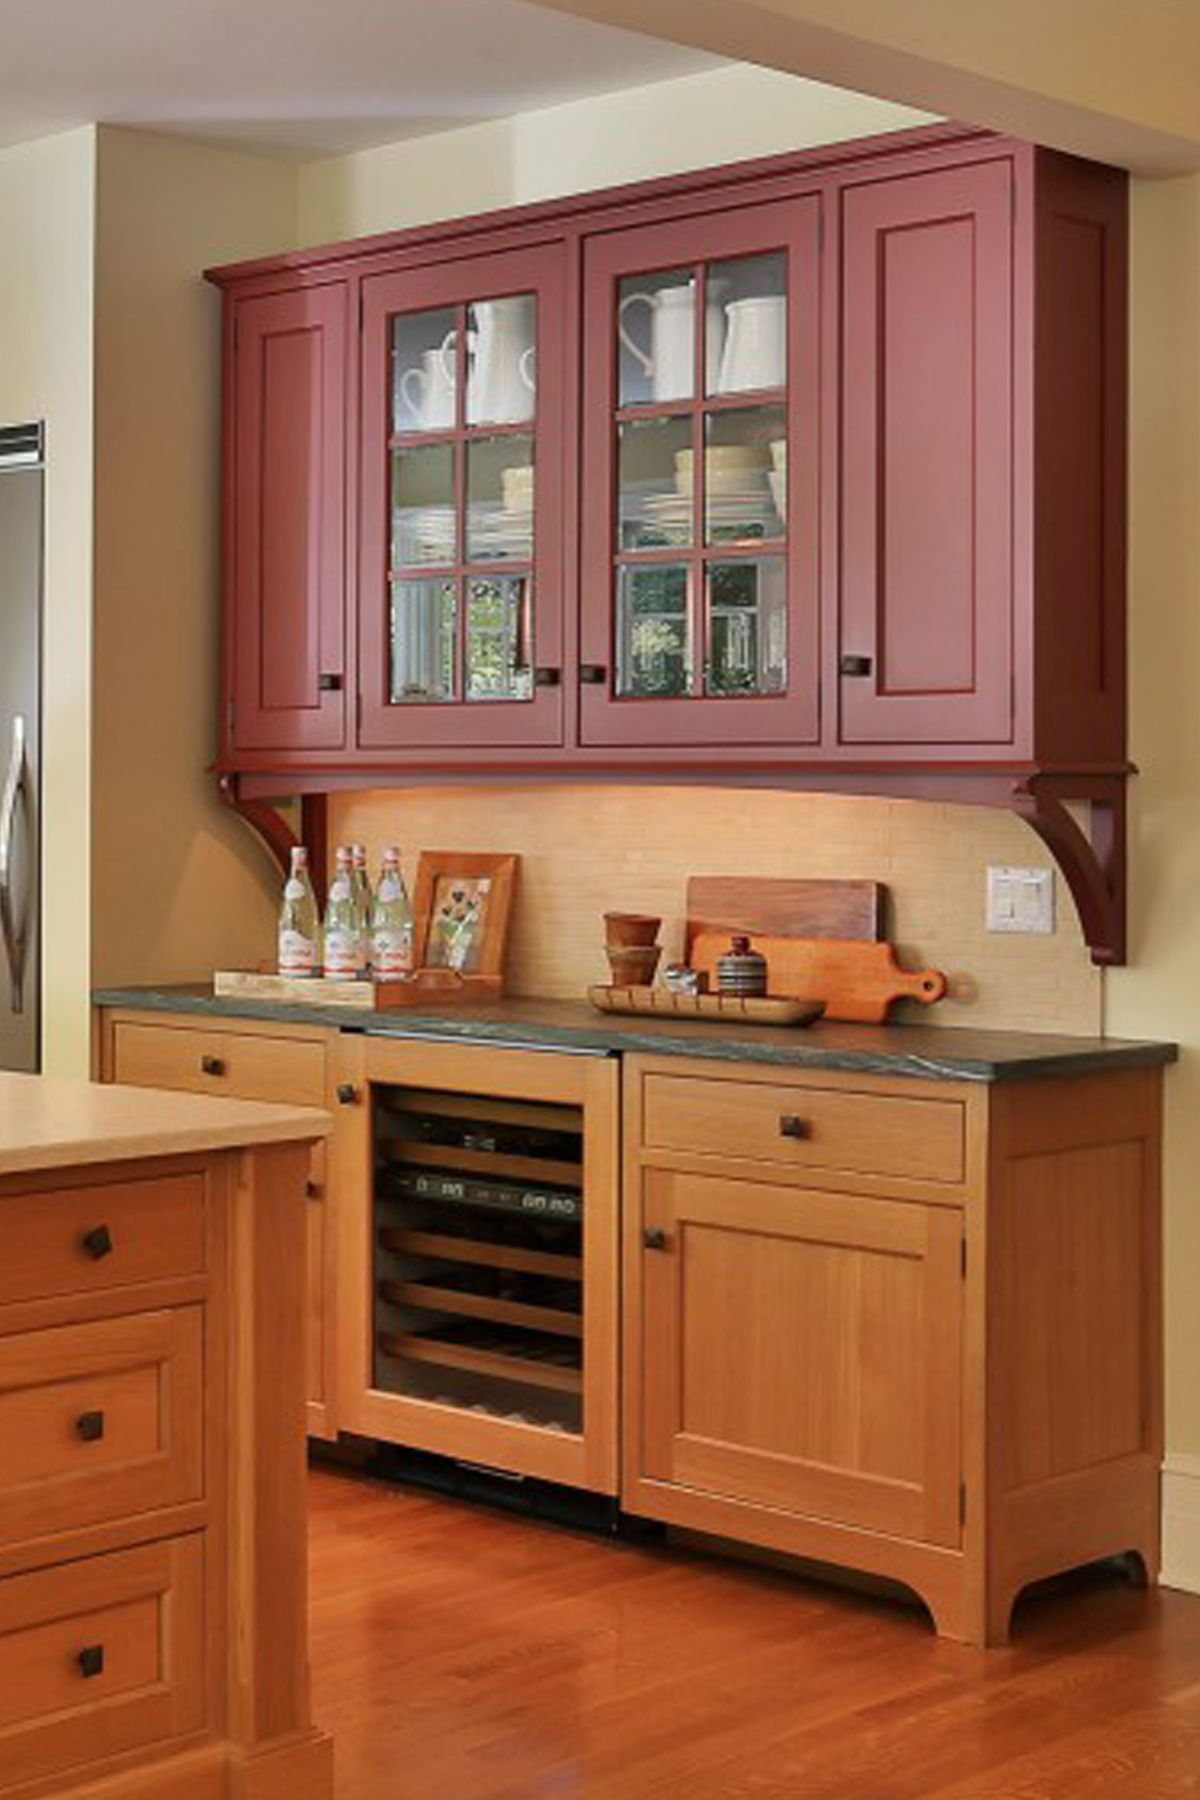 Transitional Kitchen Design Bilotta, NY Wooden kitchen